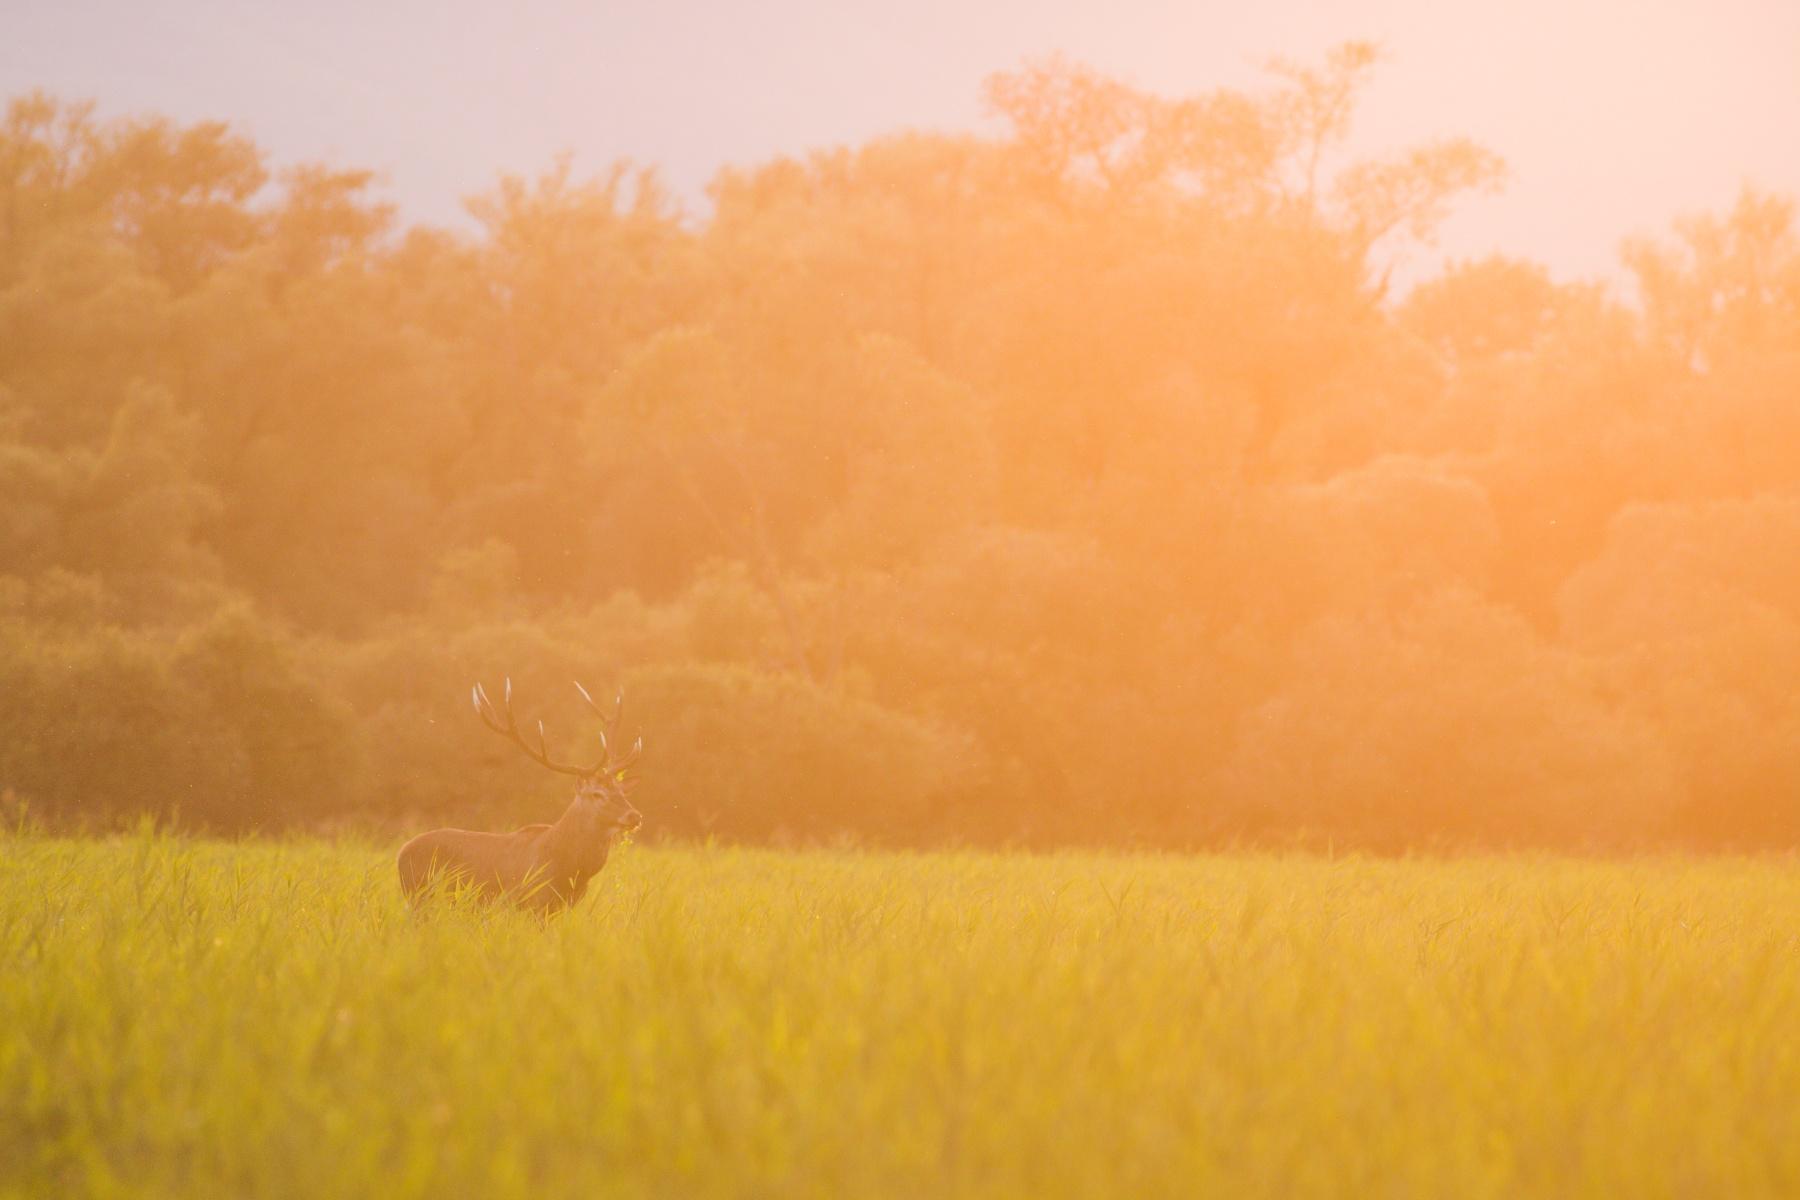 jeleň lesný (Cervus elaphus) Red deer, NPR Kláštorské lúky, Turčianska kotlina, Slovensko Canon EOS 6D mark II, Canon 400 mm f5.6 L USM, f6.3, 1/400, ISO 1000, 15. september 2019